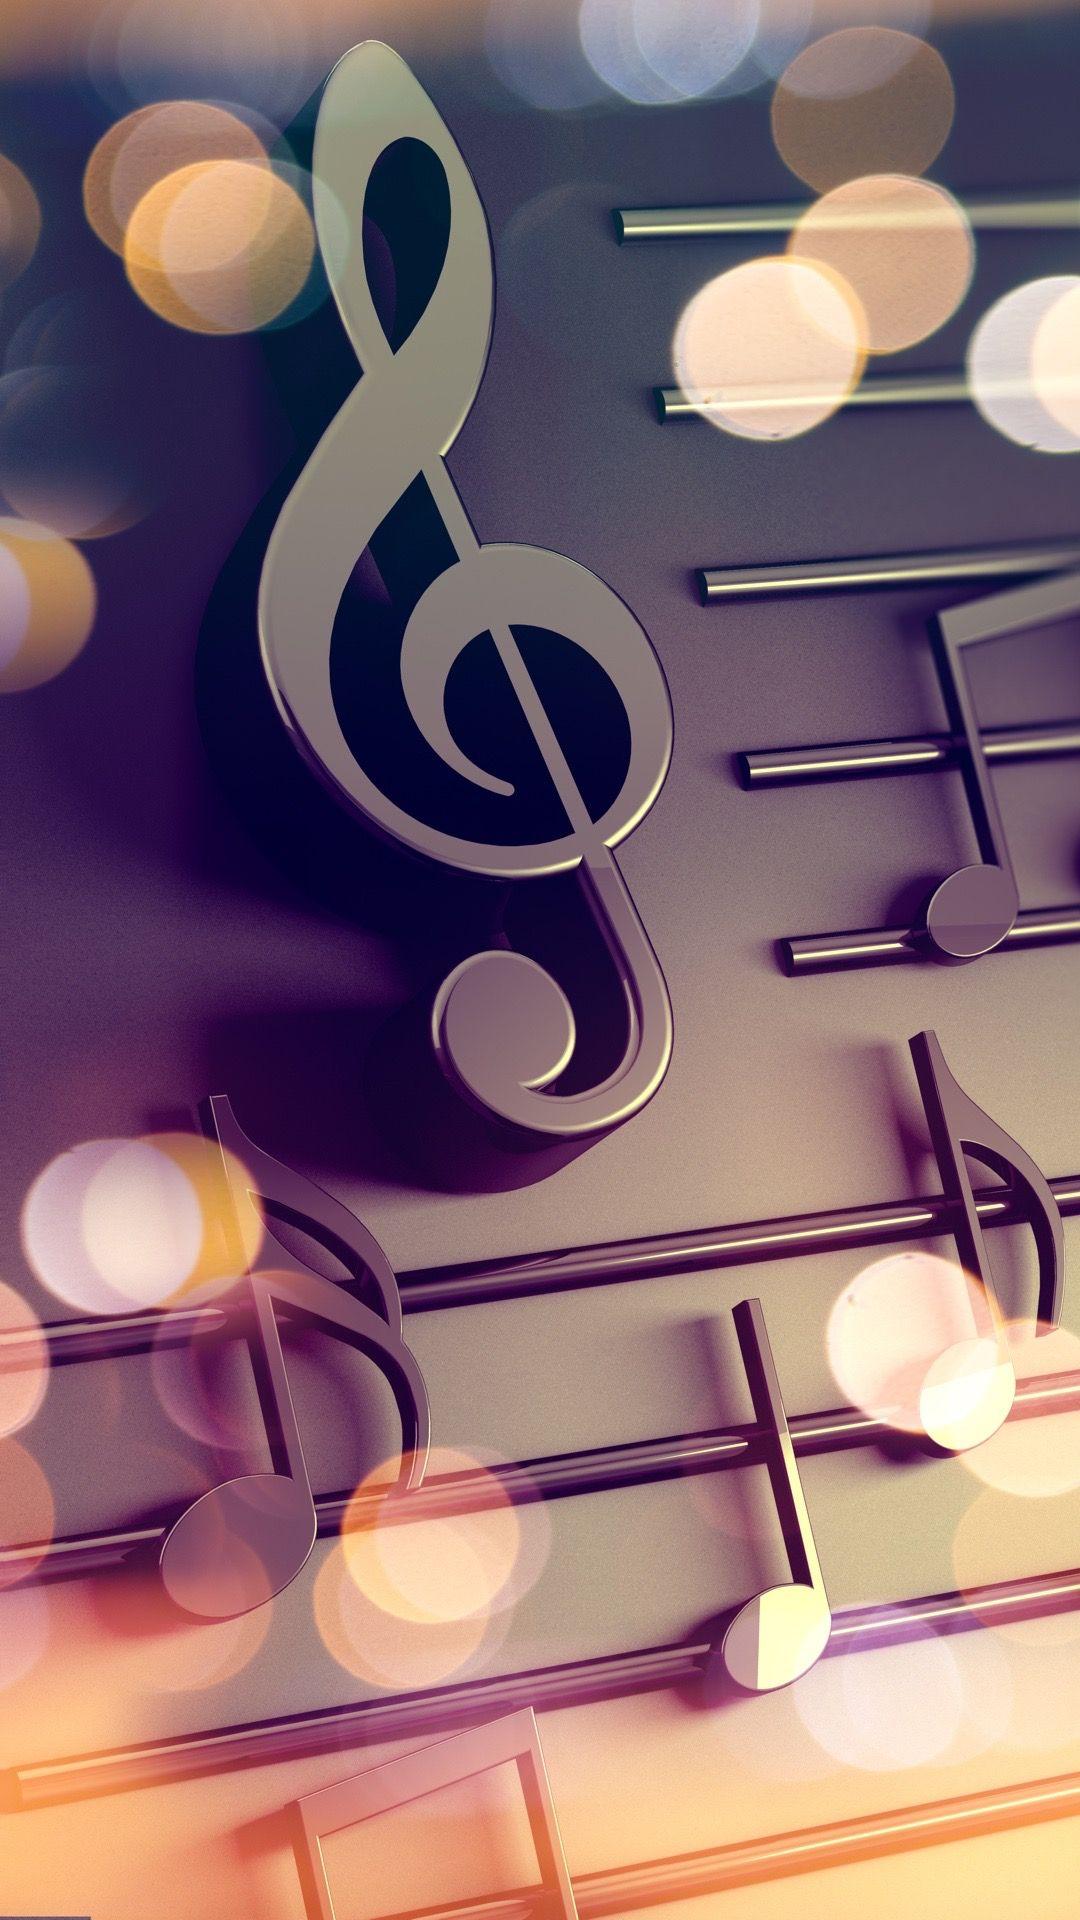 La musica mueve al mundo...